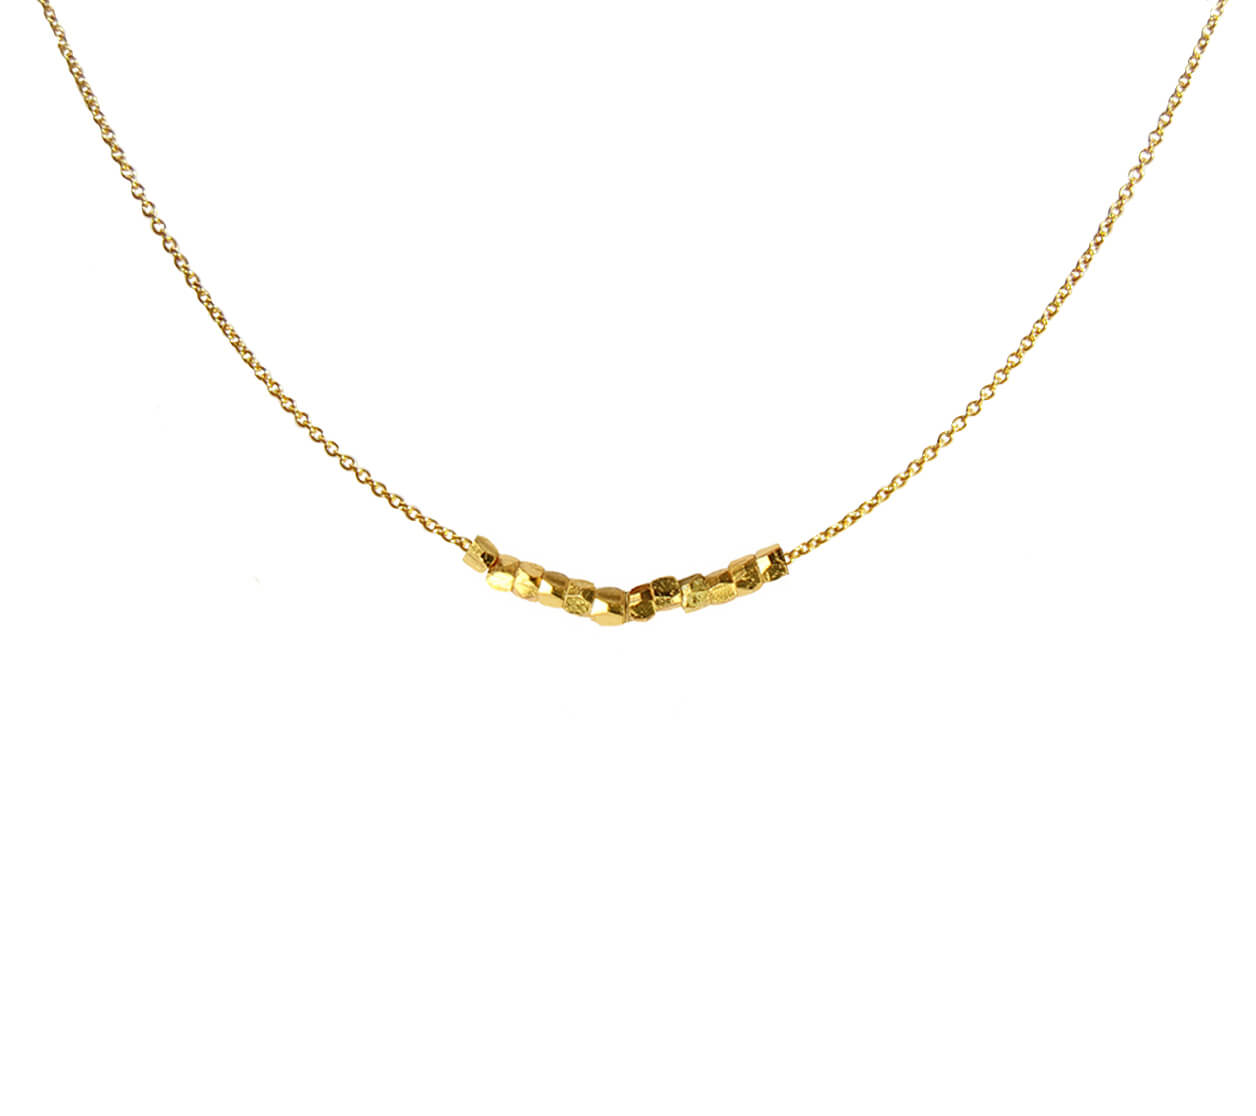 Mas Jewelz collier Facet Blackstone om 1 cm Goud